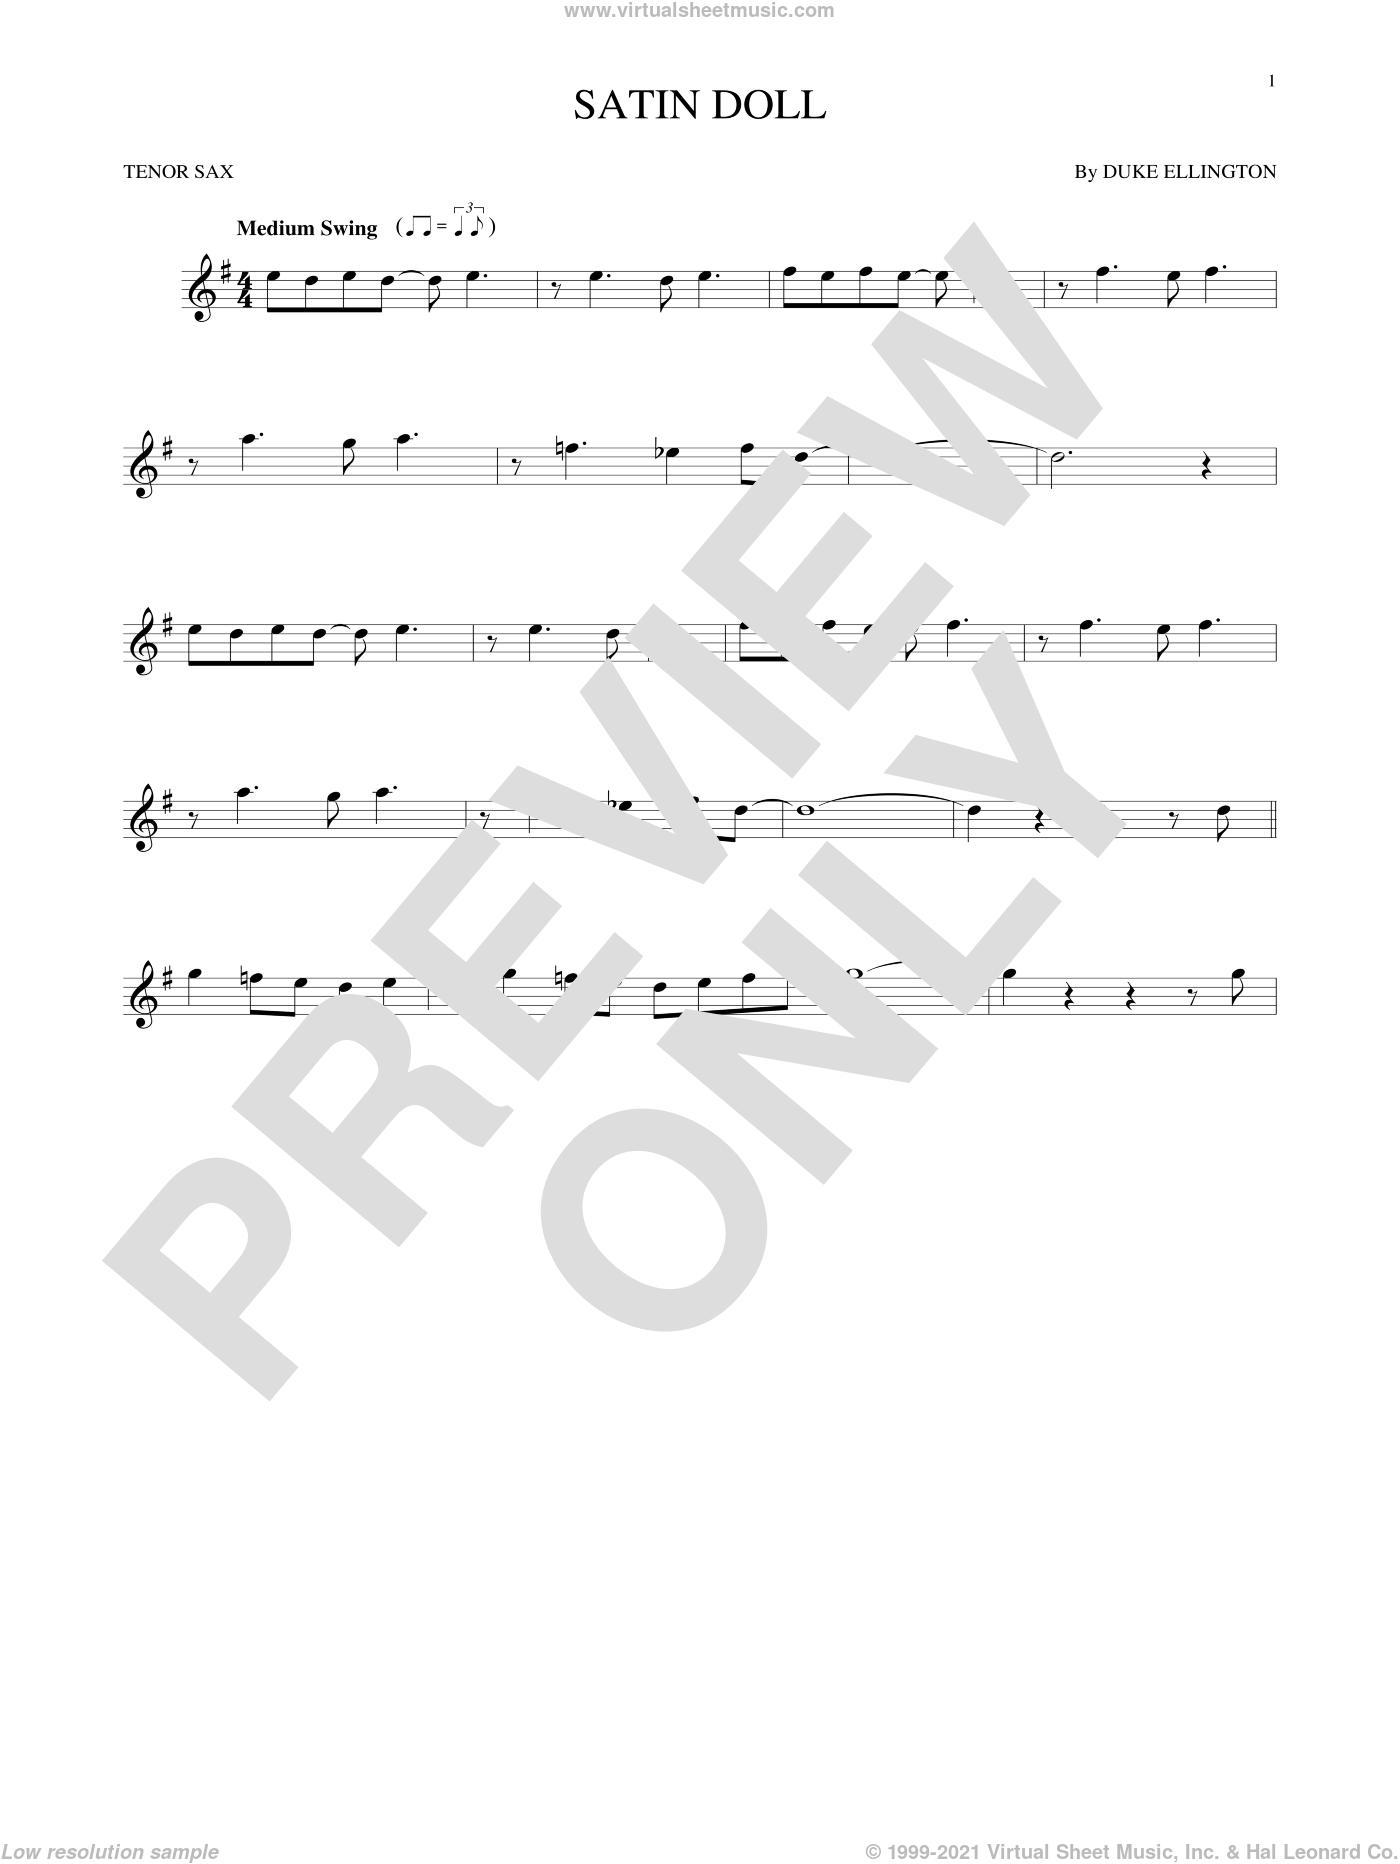 Satin Doll sheet music for tenor saxophone solo by Duke Ellington, Billy Strayhorn and Johnny Mercer, intermediate skill level